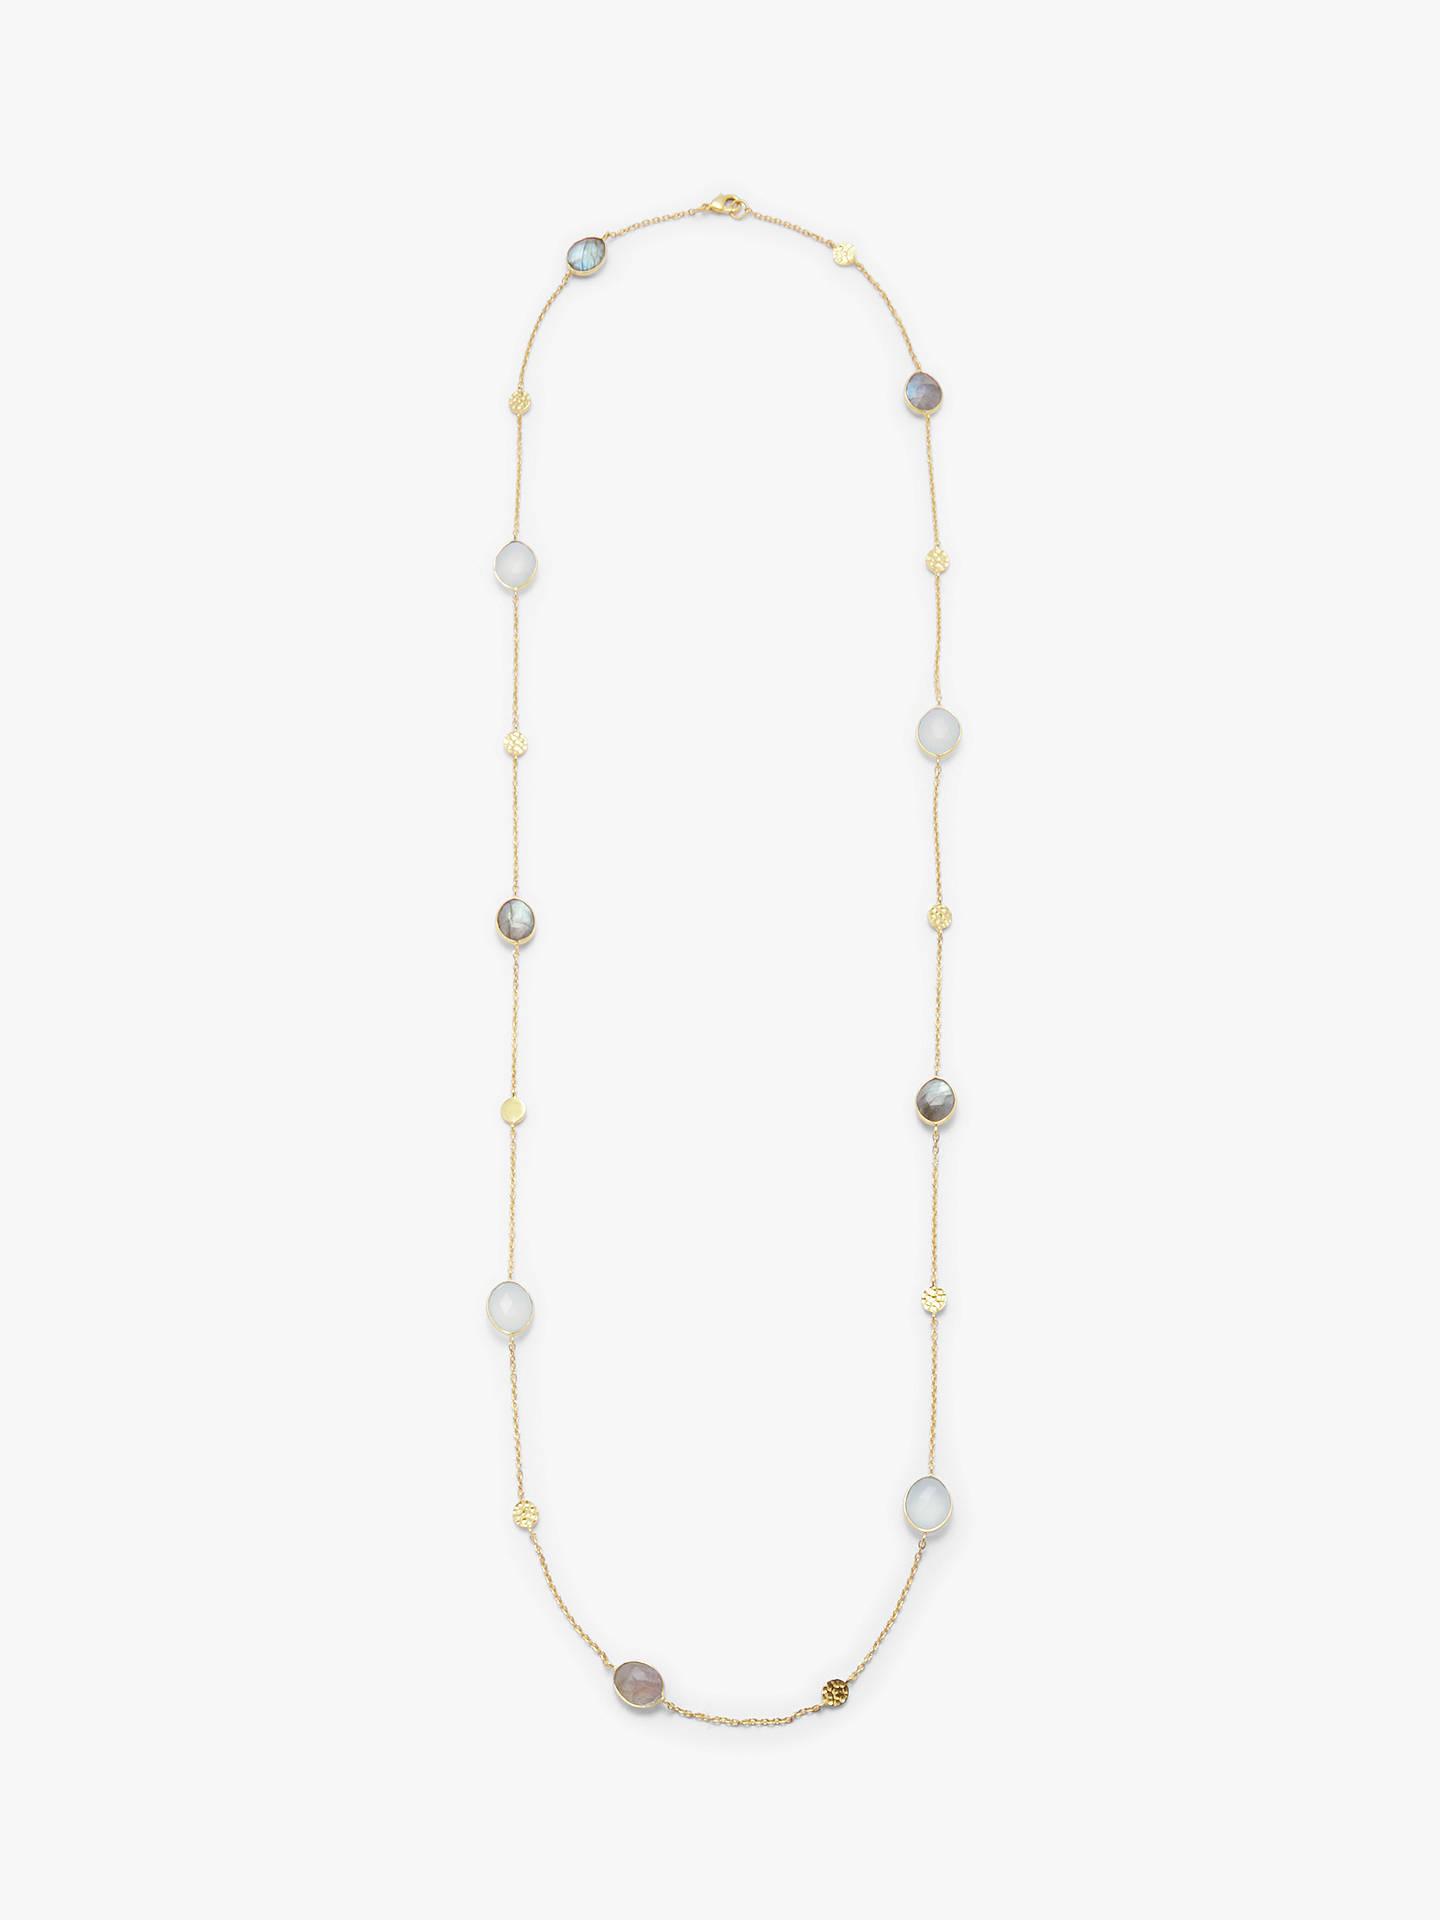 70565e5ccc0e6 John Lewis & Partners Gemstones Multi Stone Long Chain Necklace, Aqua  Chalcedony/Labradorite